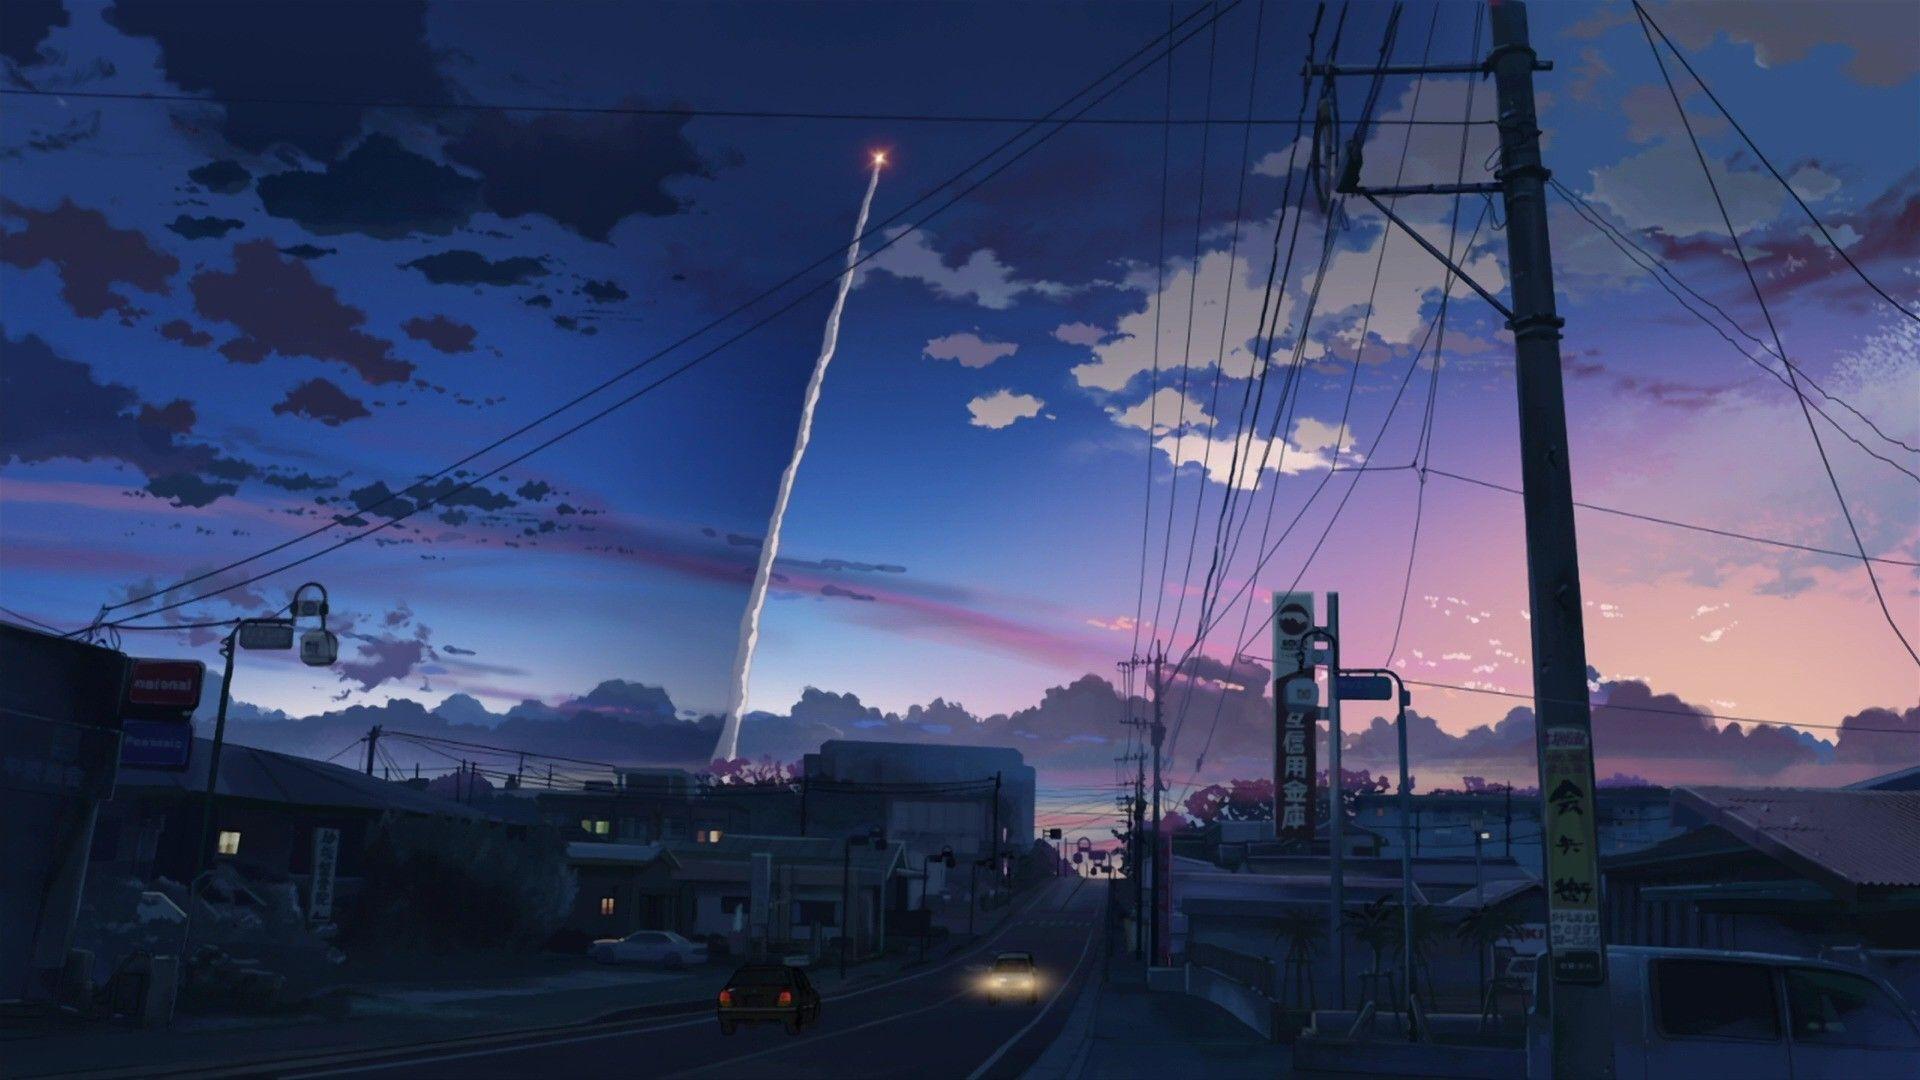 4k Wallpaper Anime Landscape Hd Art Wallpaper In 2020 Anime Scenery Scenery Wallpaper Anime Scenery Wallpaper